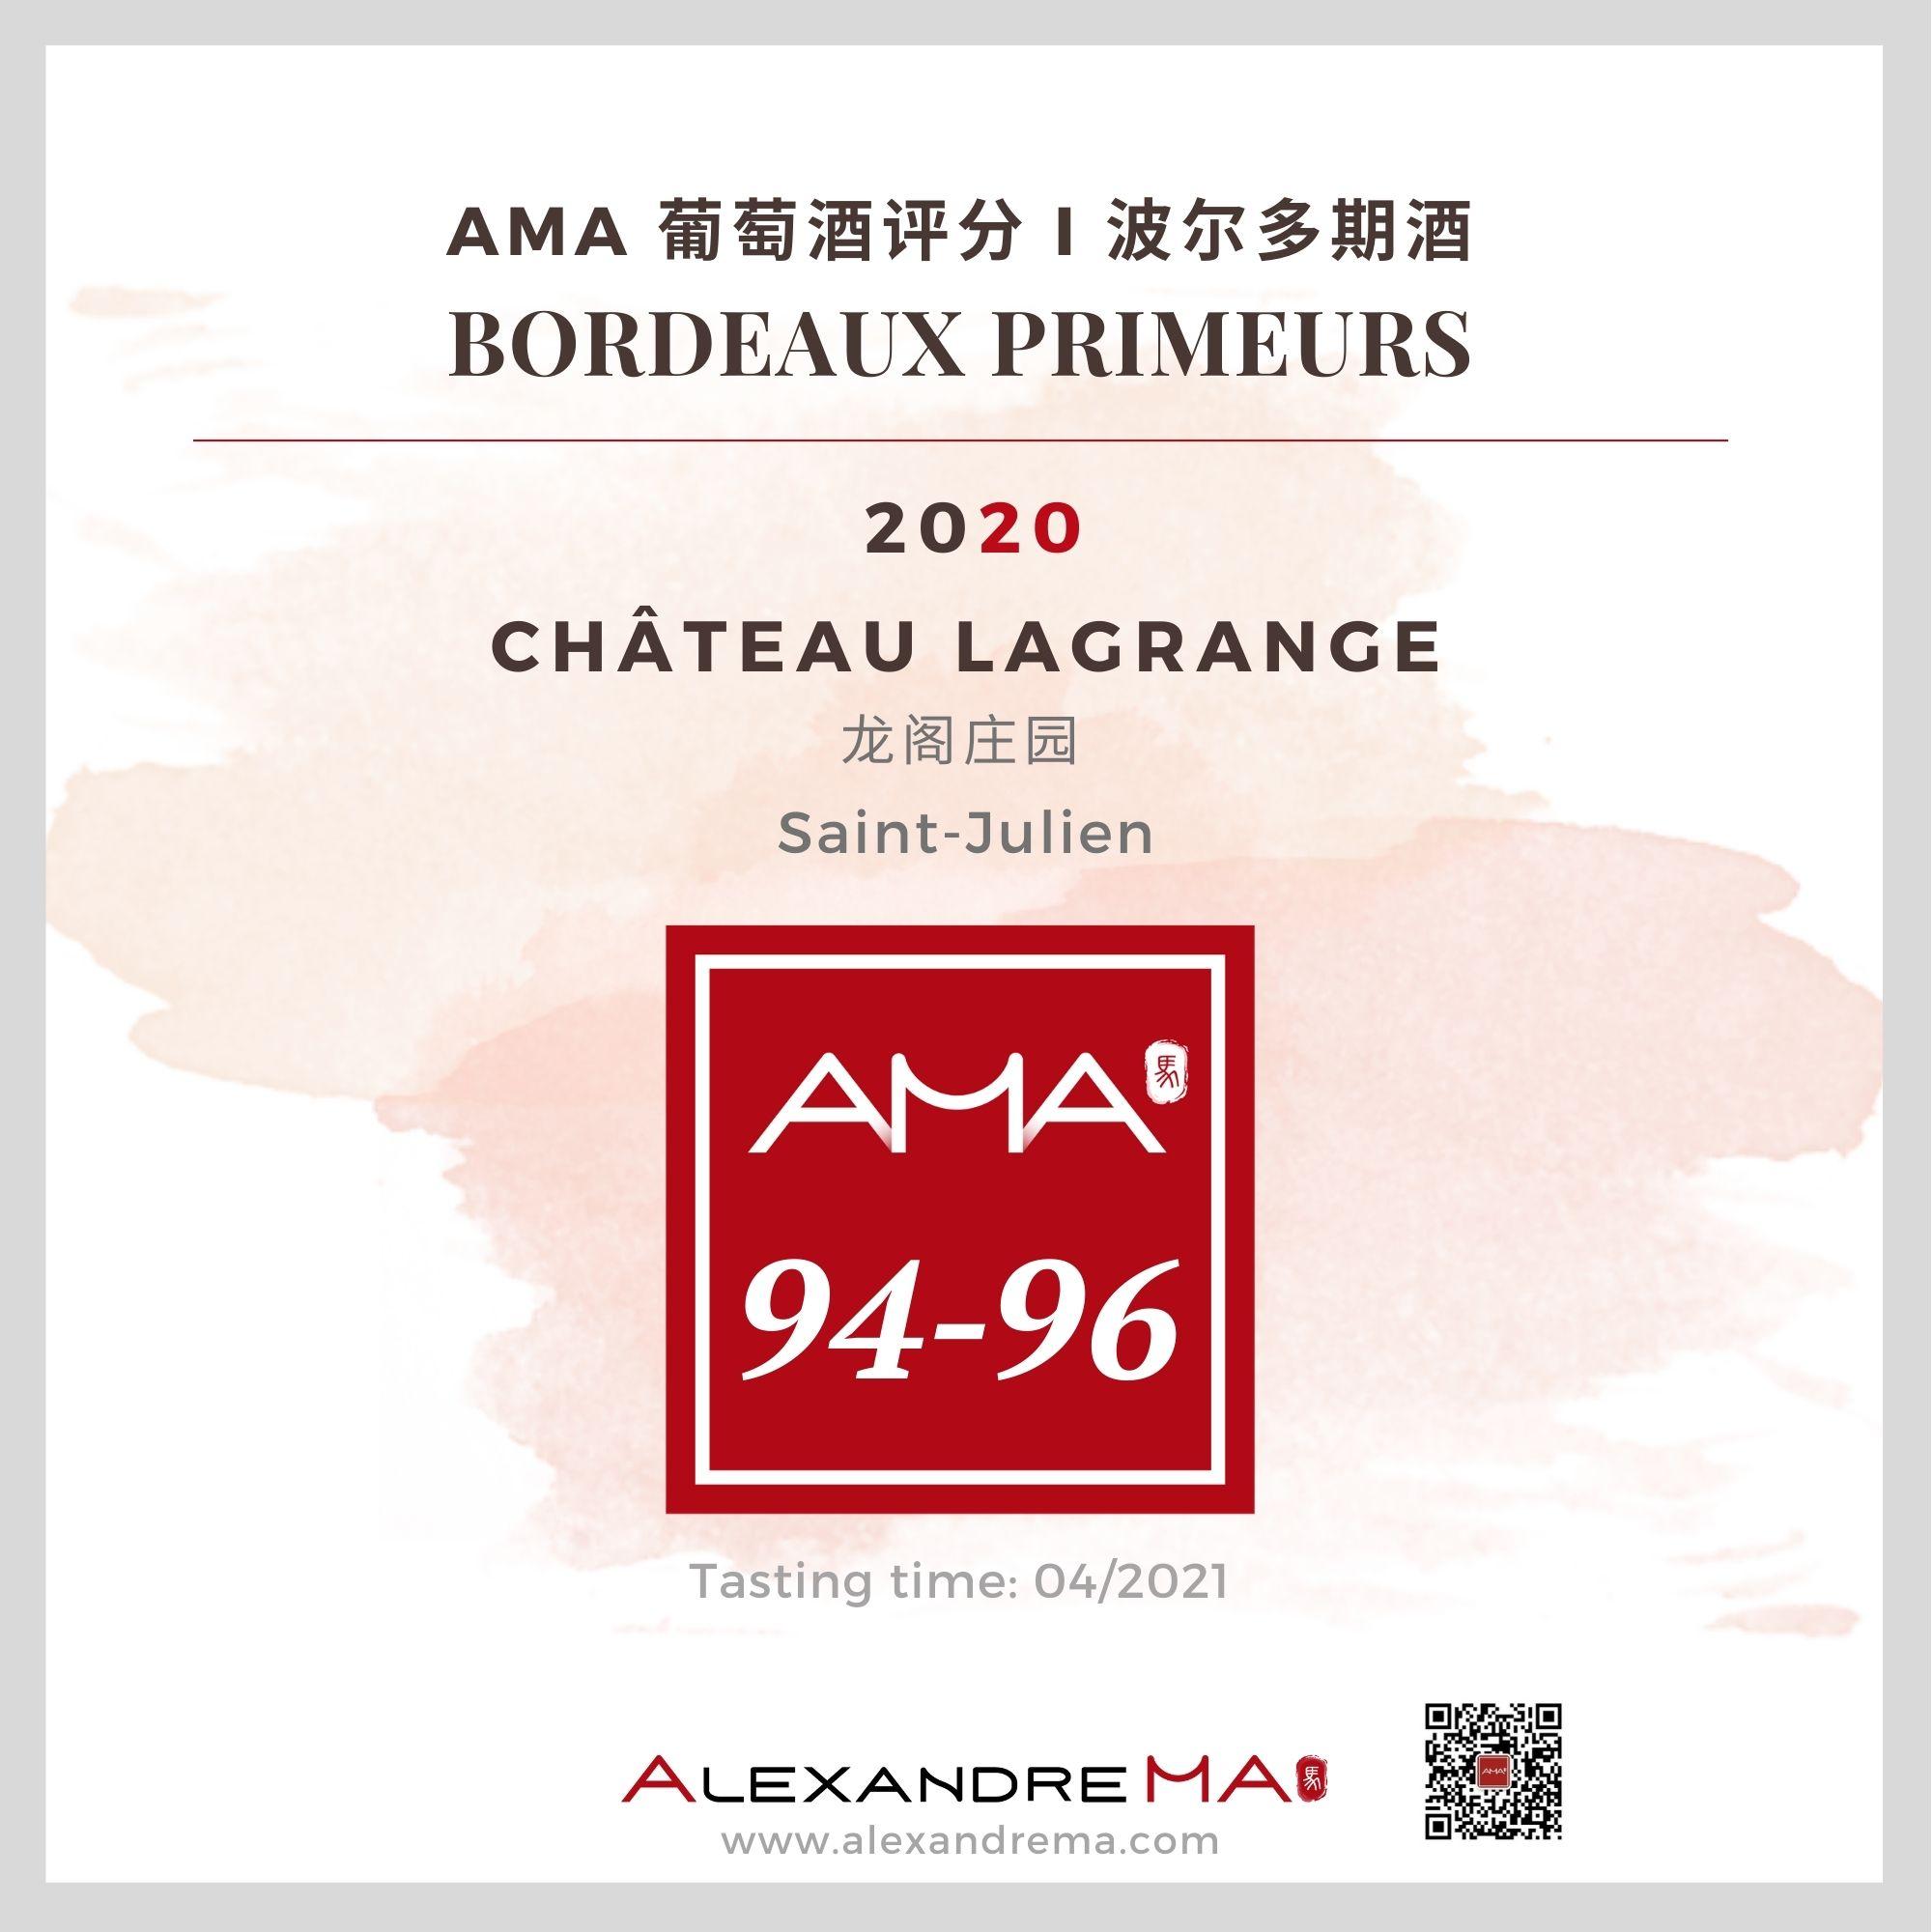 Château Lagrange 2020 - Alexandre MA